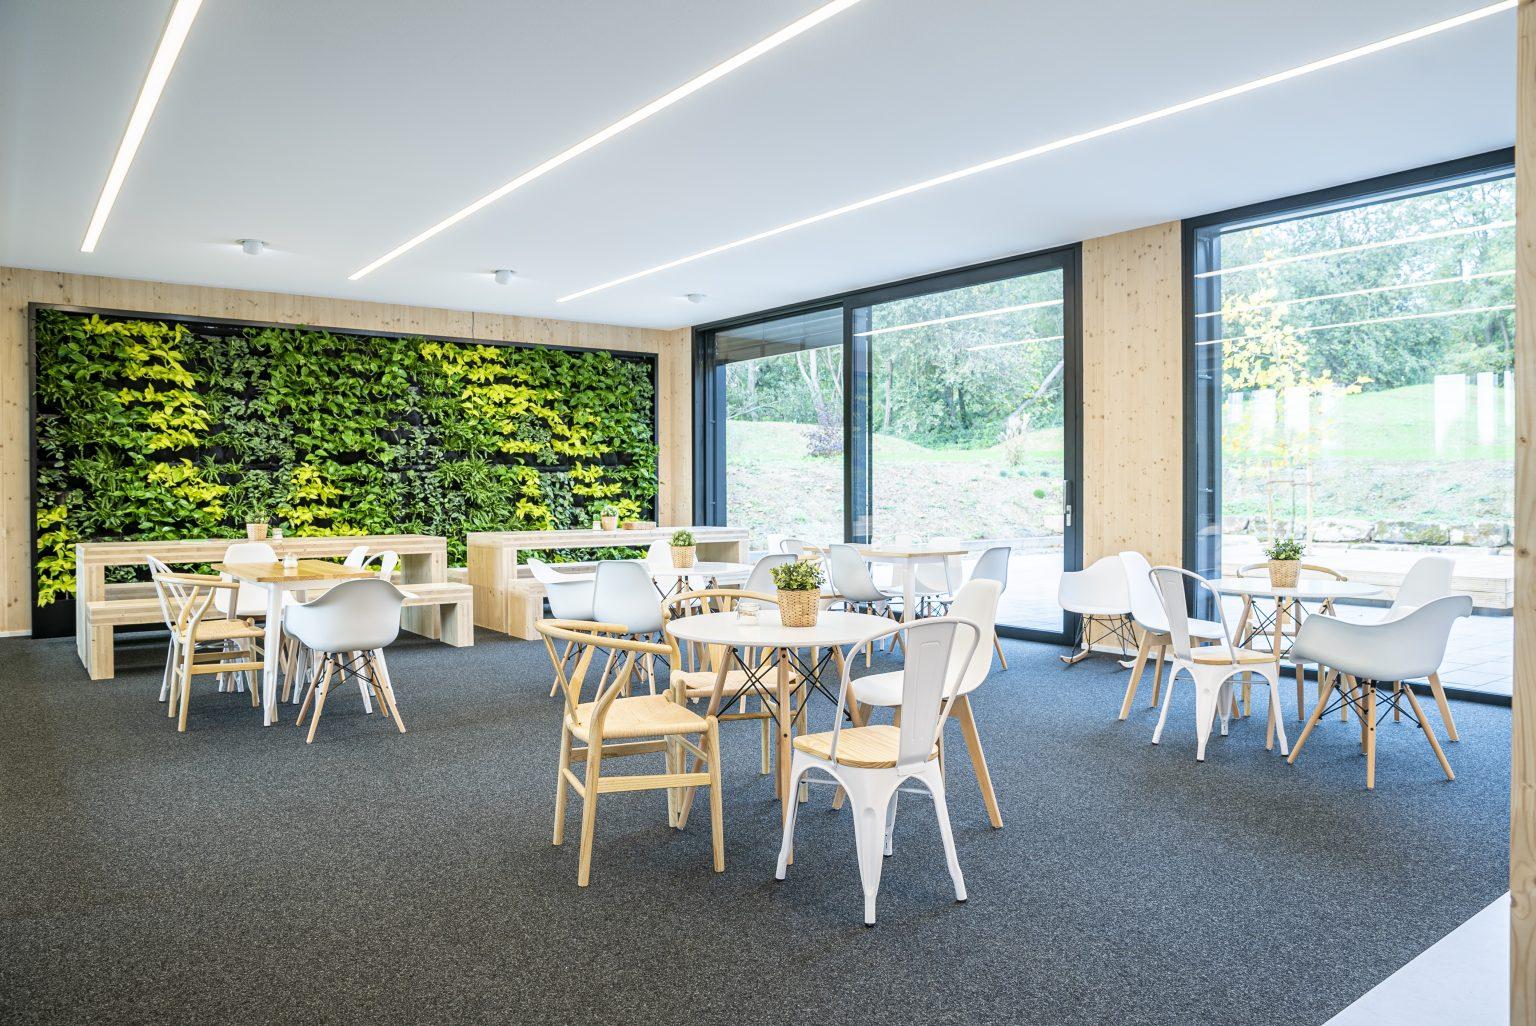 Bürogebäude_Zick-Hessler_Holzbauweise (12)